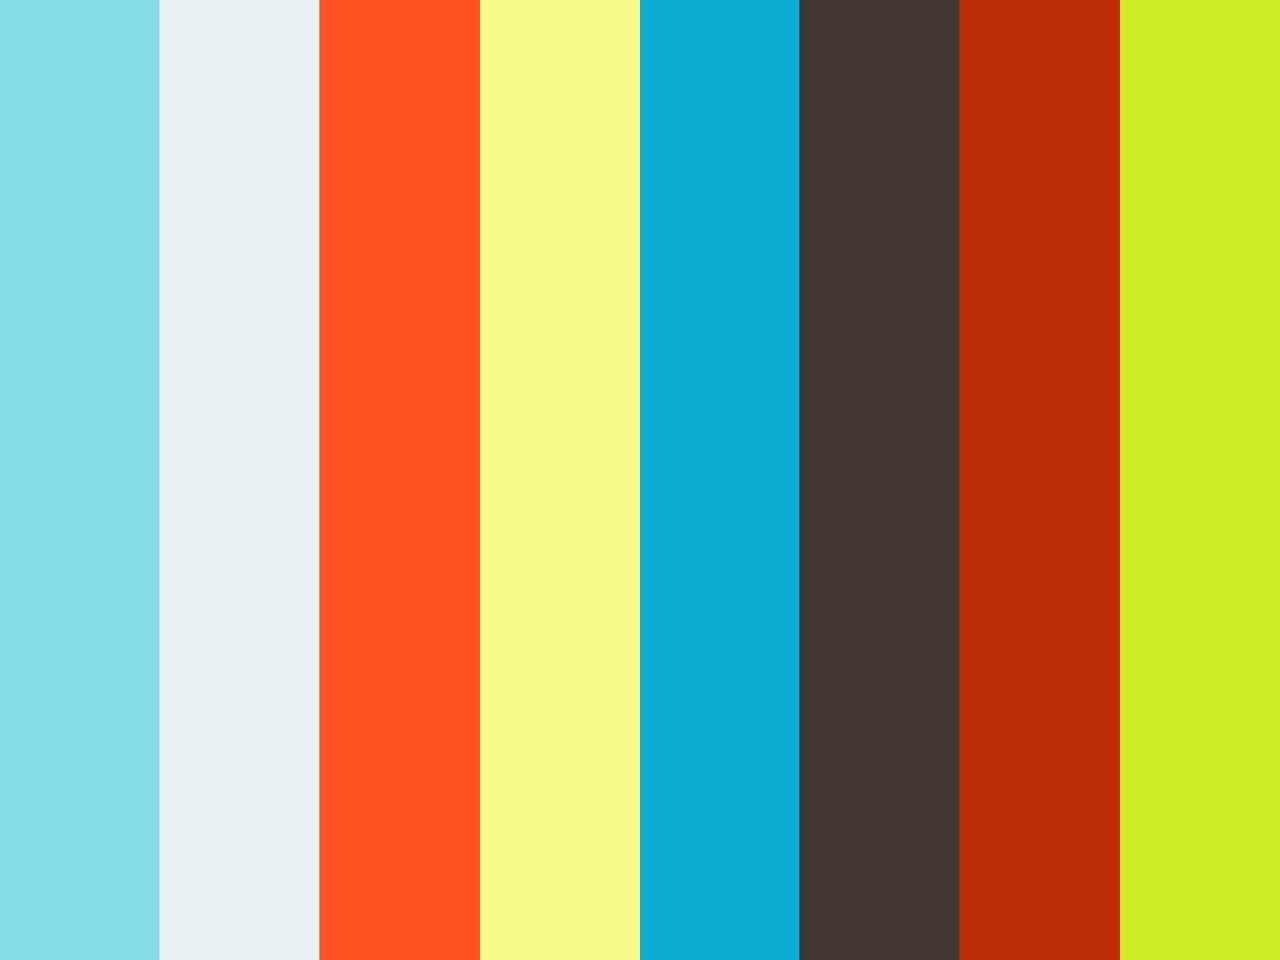 002826 - Assuconsulting - 23 - Druppelsparen